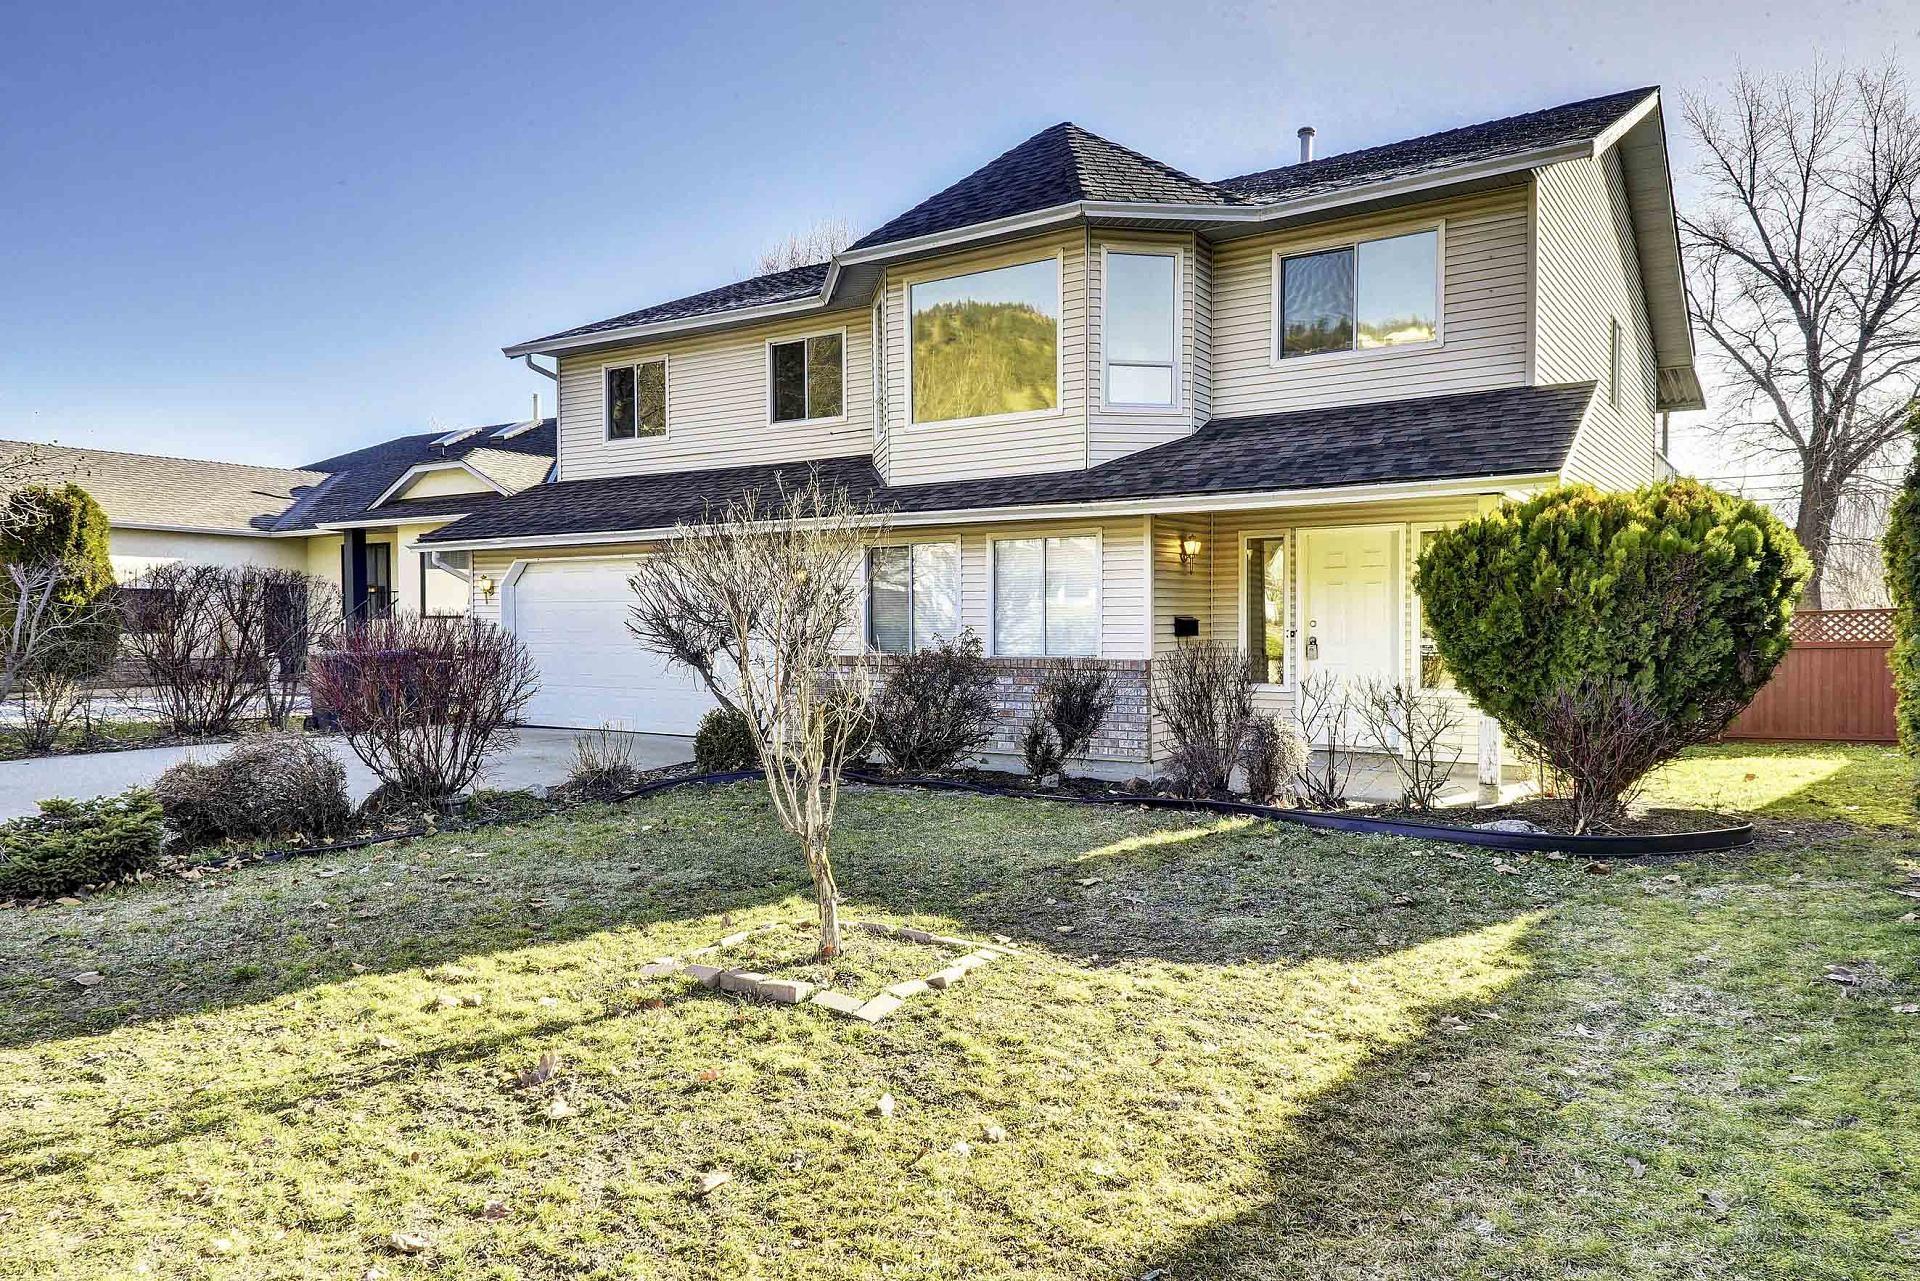 241 Ranchland Road Kelowna Bc V1v 1t3 Homes For Sale